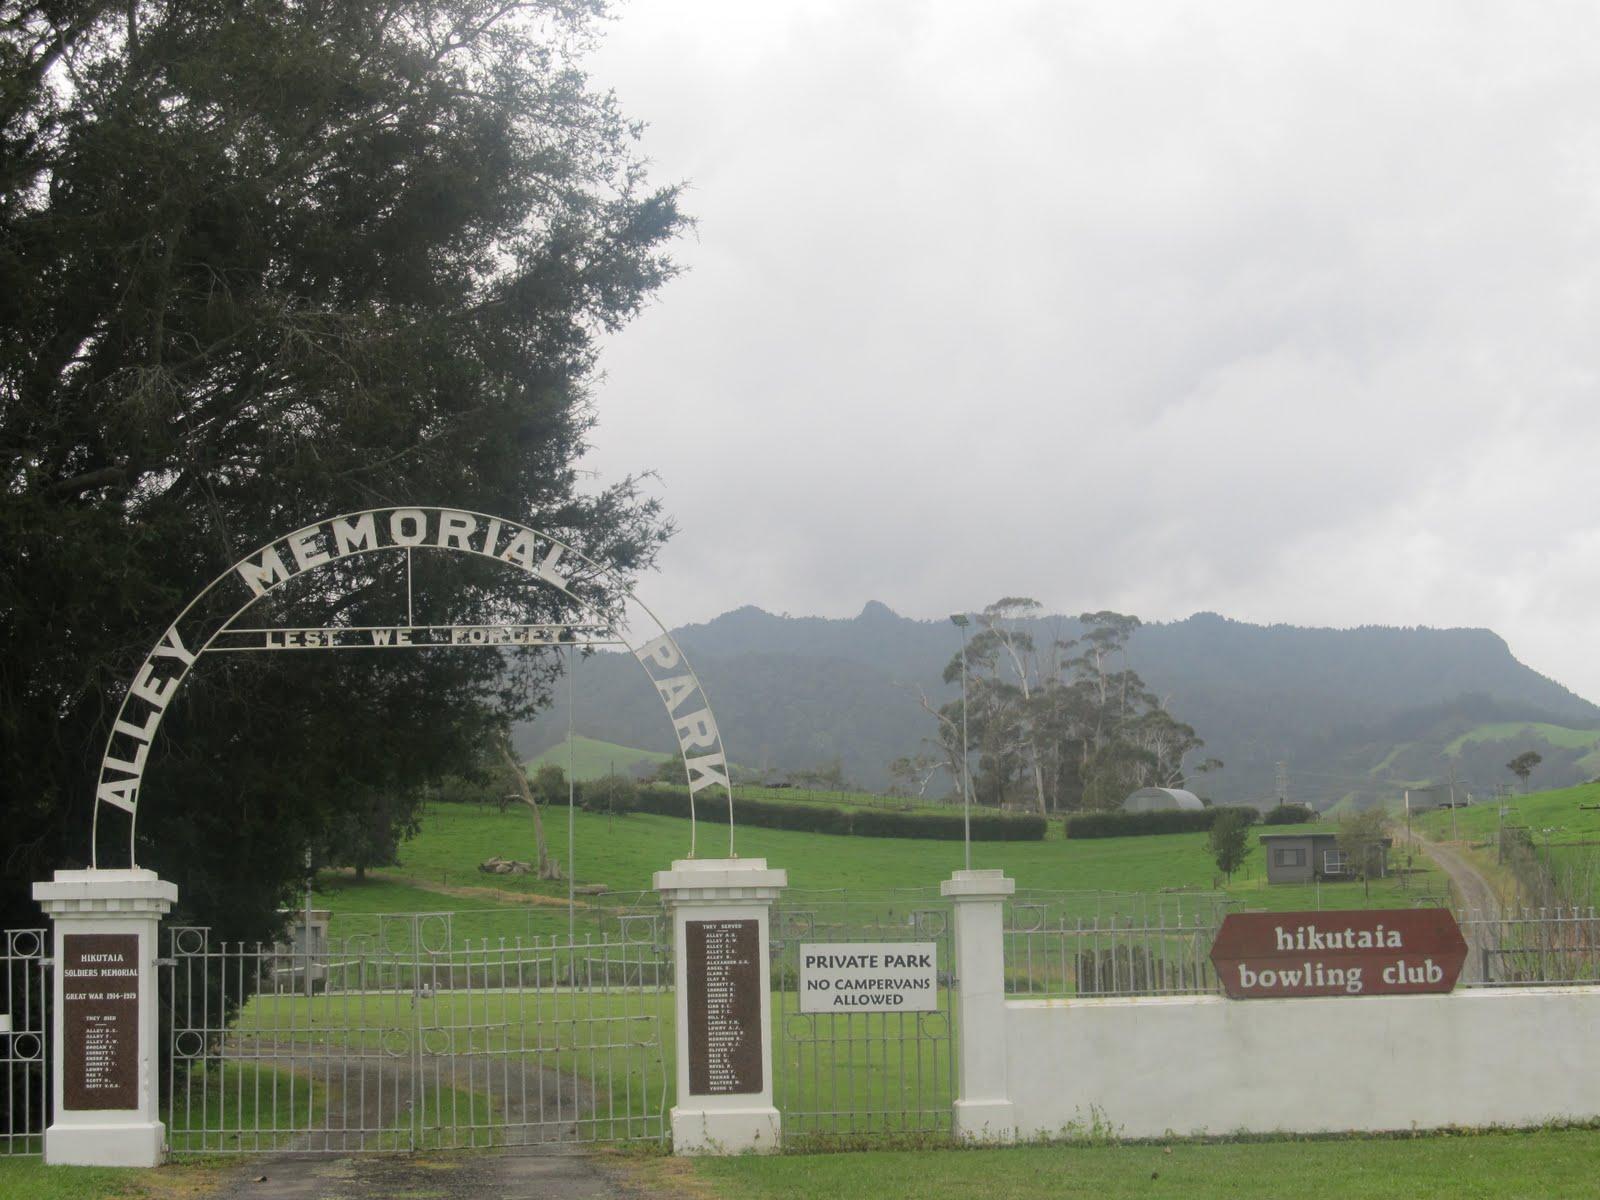 Hikutaia New Zealand  City new picture : ... World War One Memorials 1914 2014: Hikutaia Memorial 22 April 2011